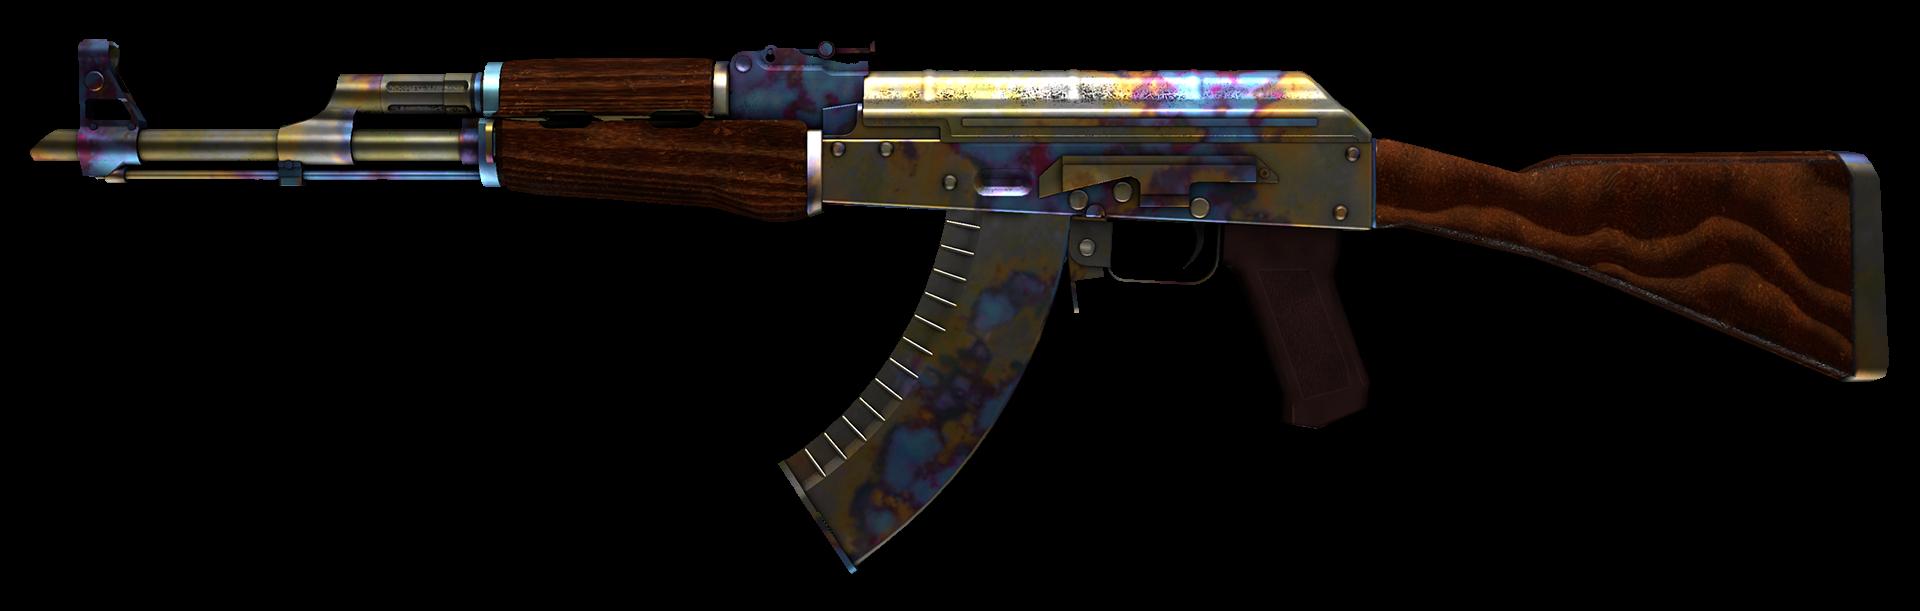 AK-47 Case Hardened Large Rendering